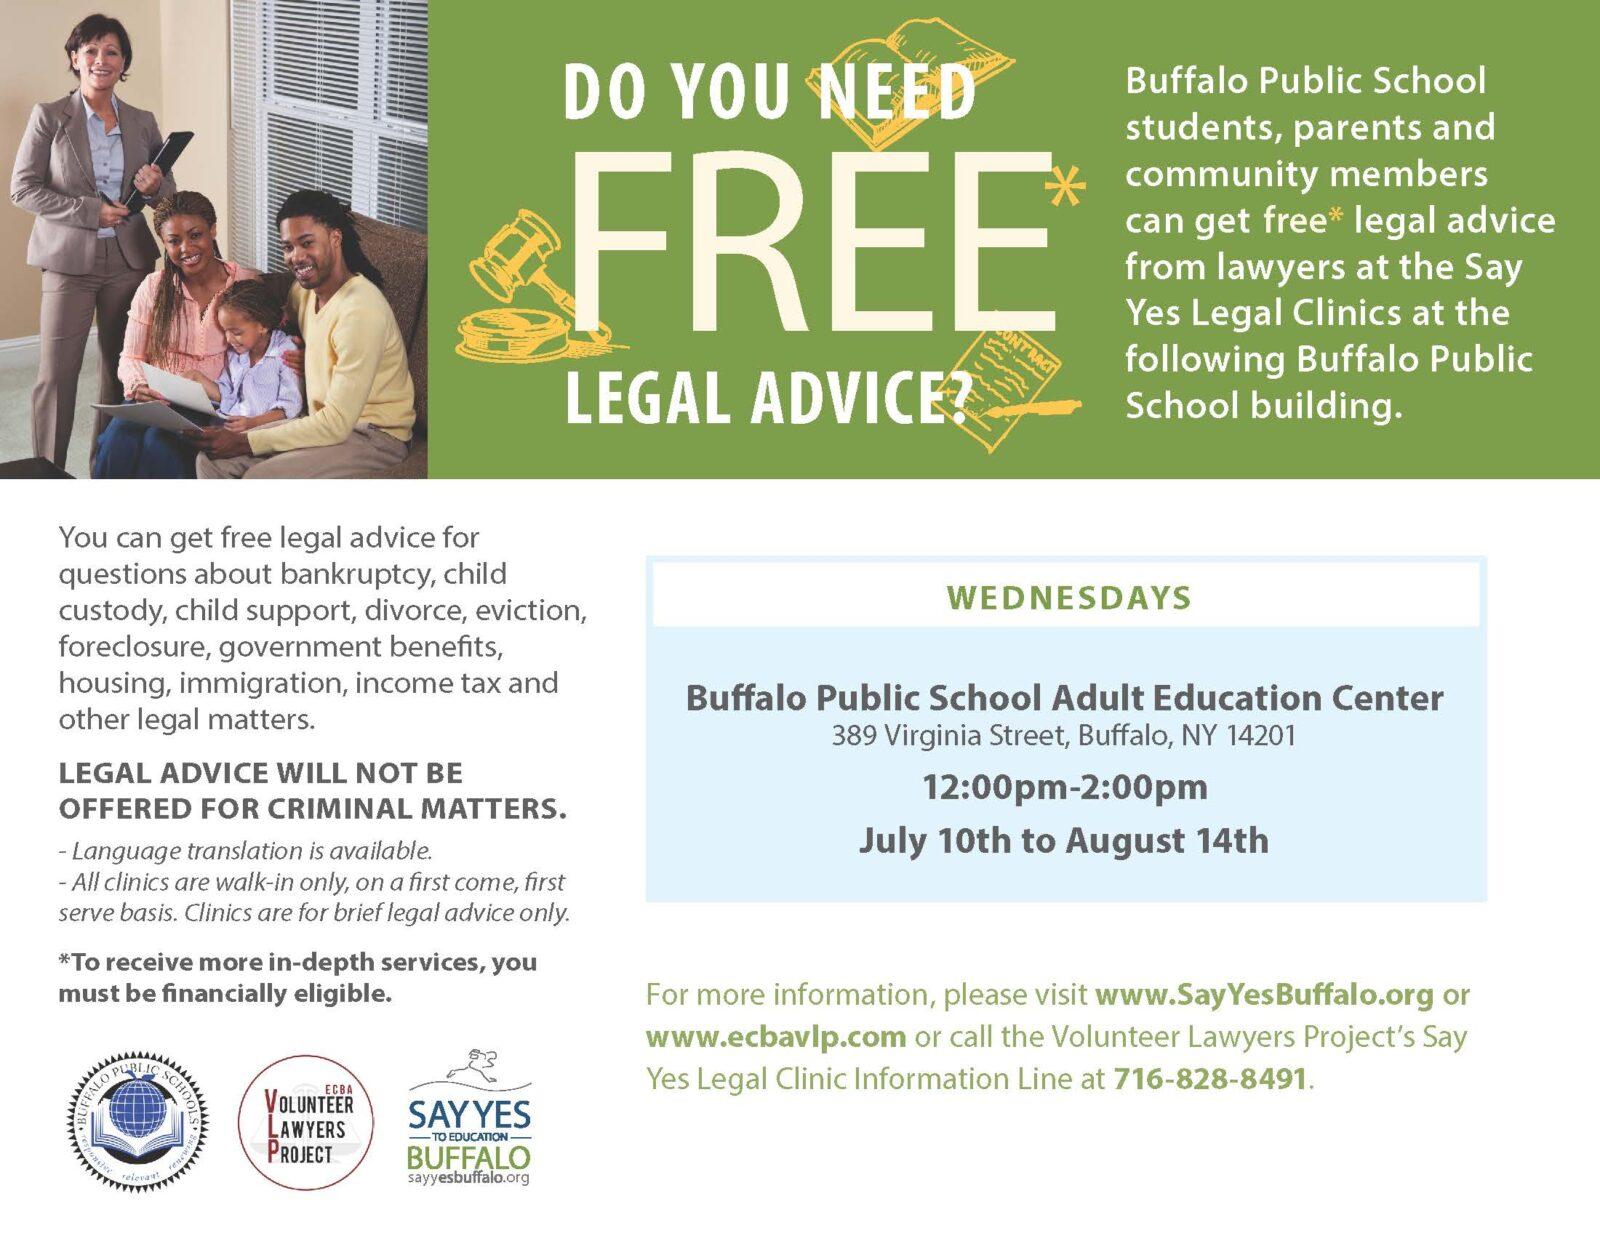 Say Yes Legal Clinics (Buffalo Public Schools) | ECBA Volunteer